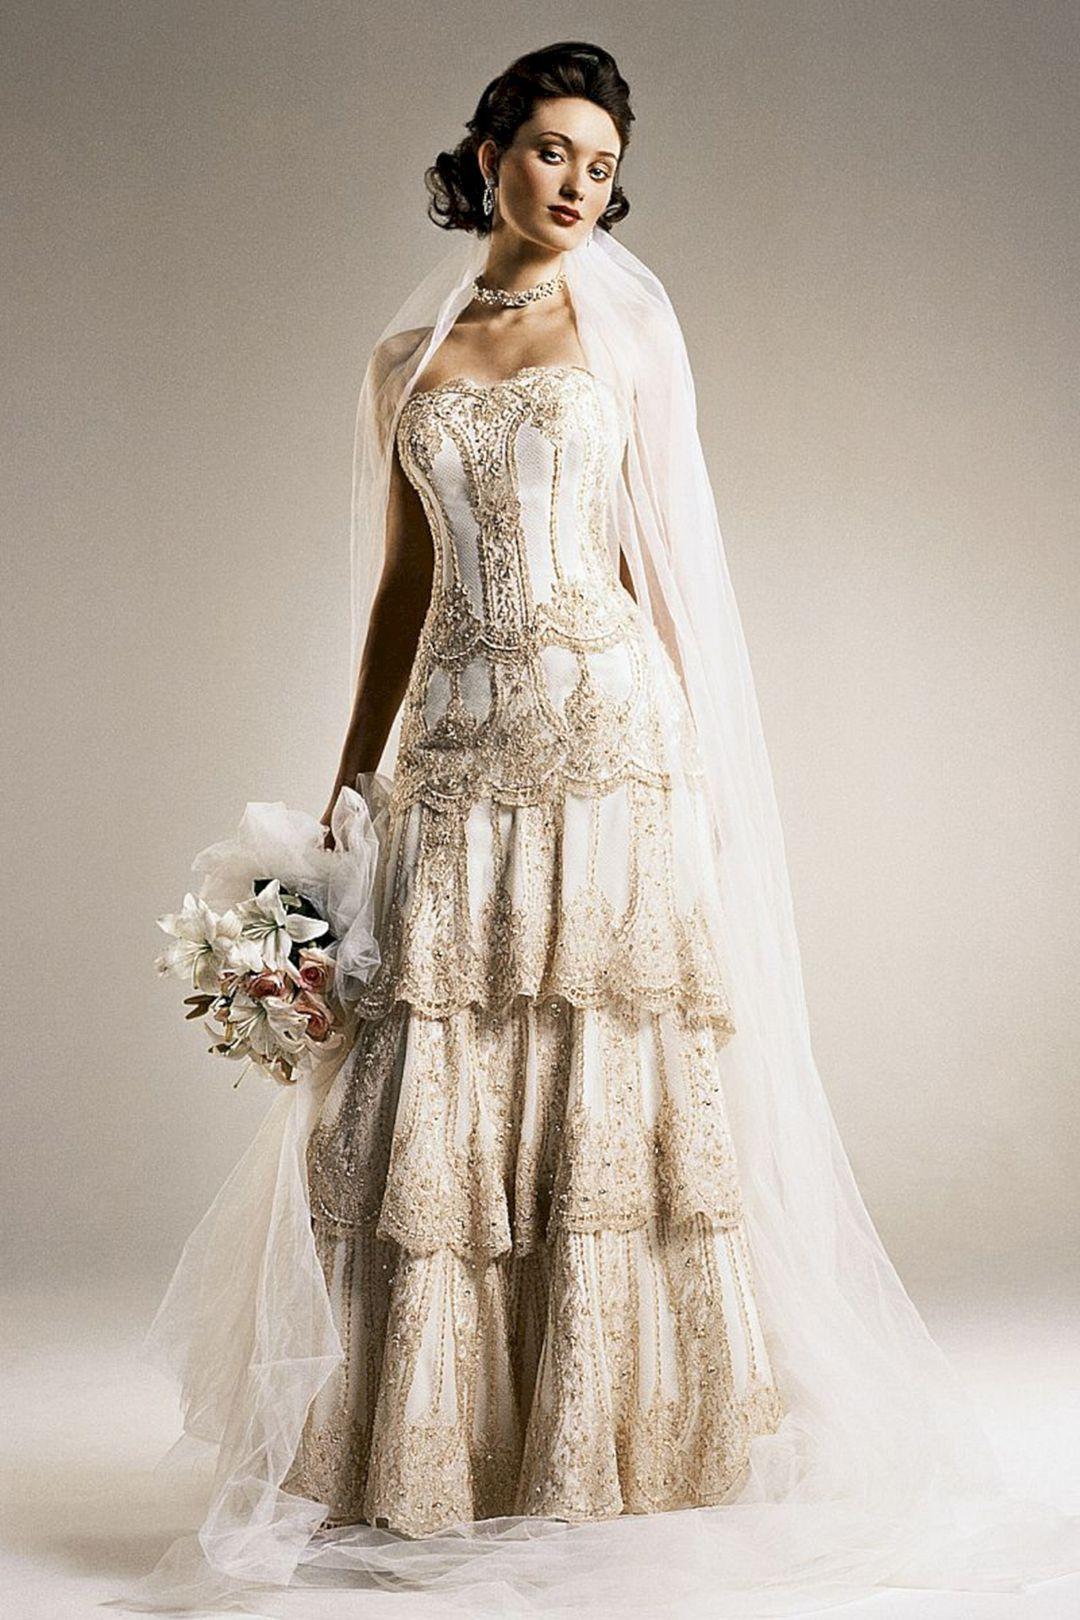 11 Elegant Vintage Wedding Dress Style That Inspire You Vintage Bridesmaid Dresses Vintage Style Wedding Gowns Vintage Inspired Wedding Dresses